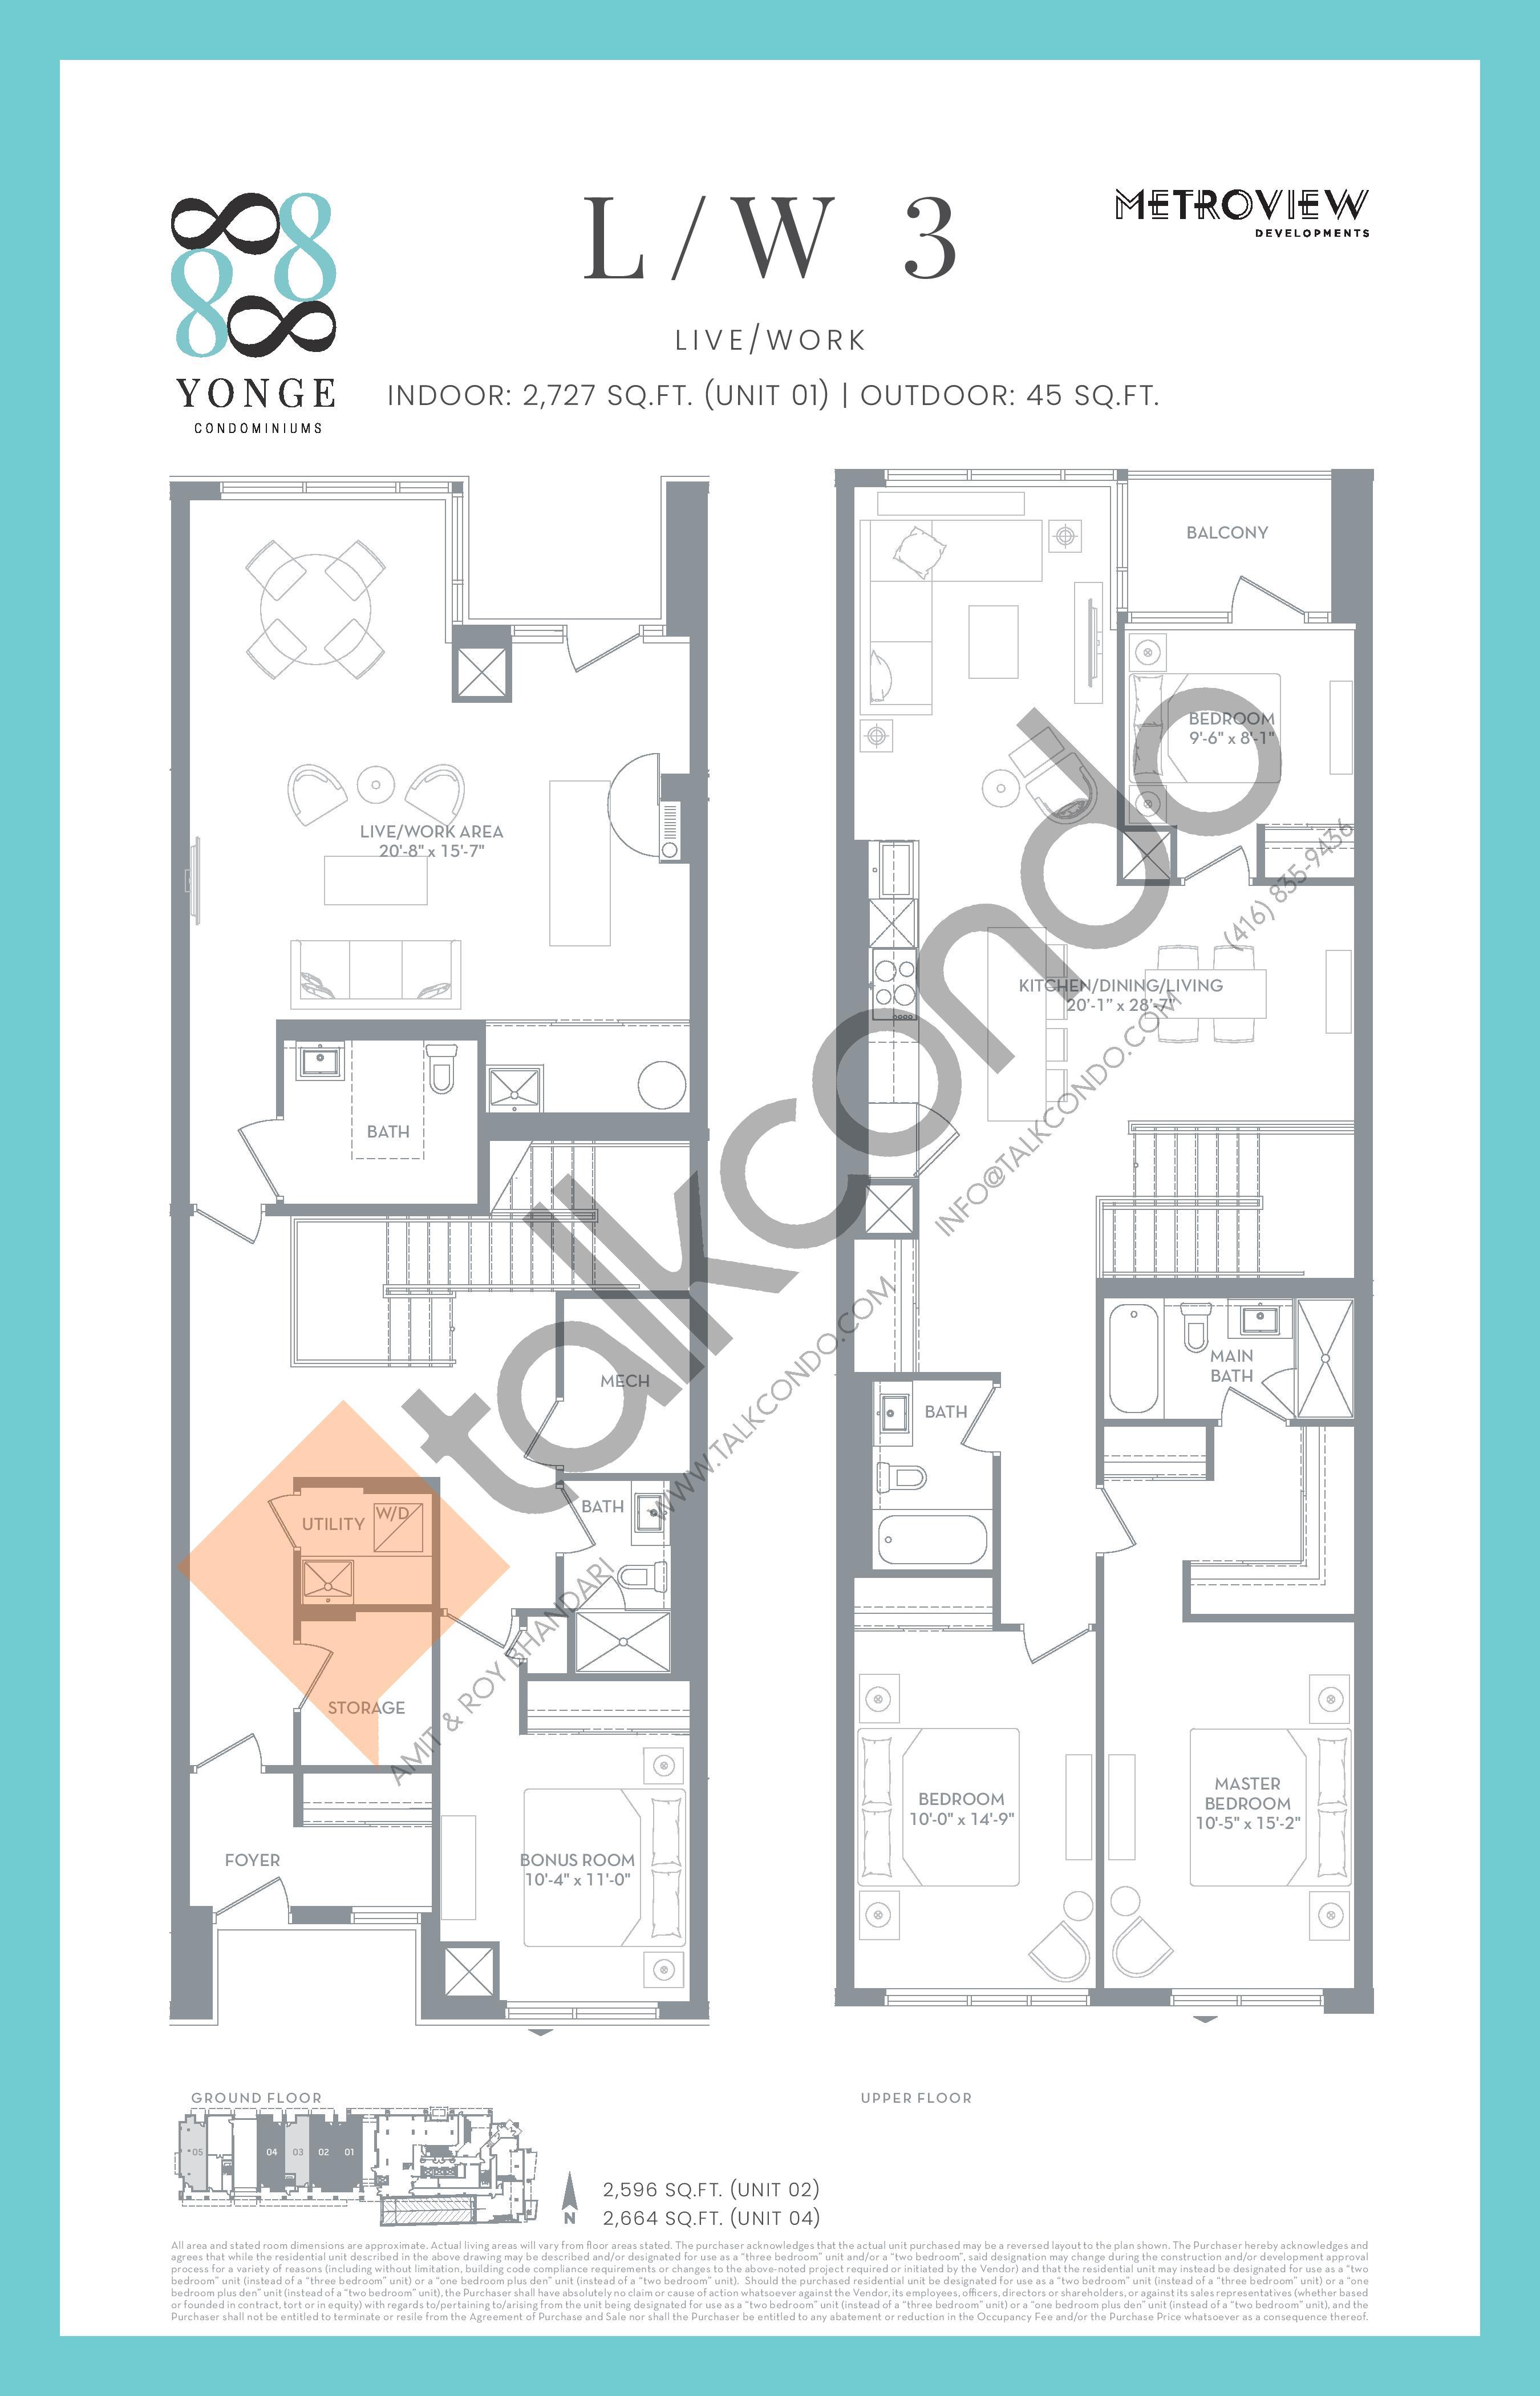 L/W 3 Floor Plan at 8888 Yonge Street Condos - 2727 sq.ft